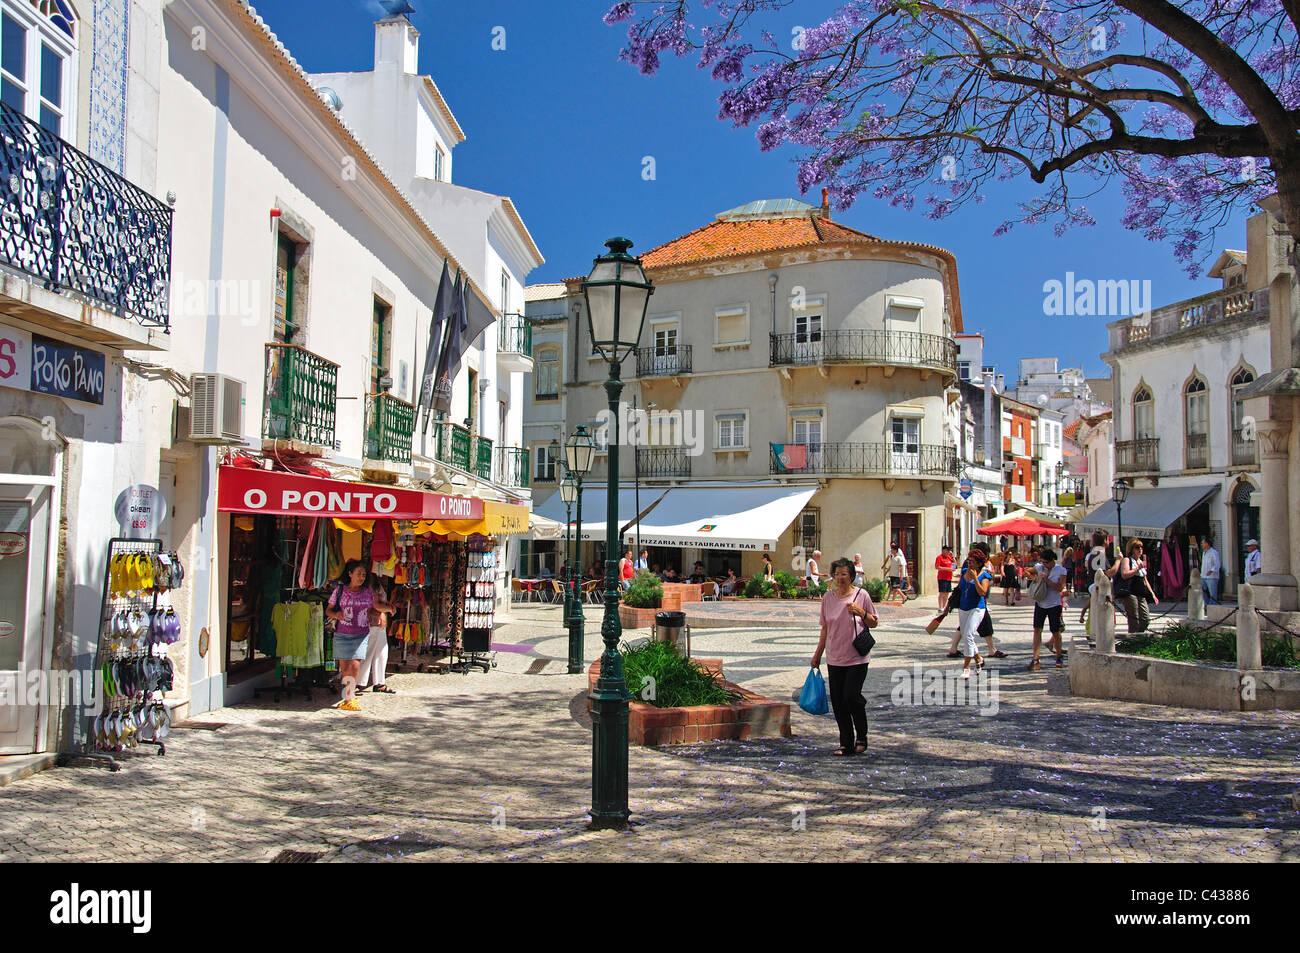 Praca Luis de Camoes, Lagos, Lagos Municipality, Faro District, Algarve Region, Portugal - Stock Image